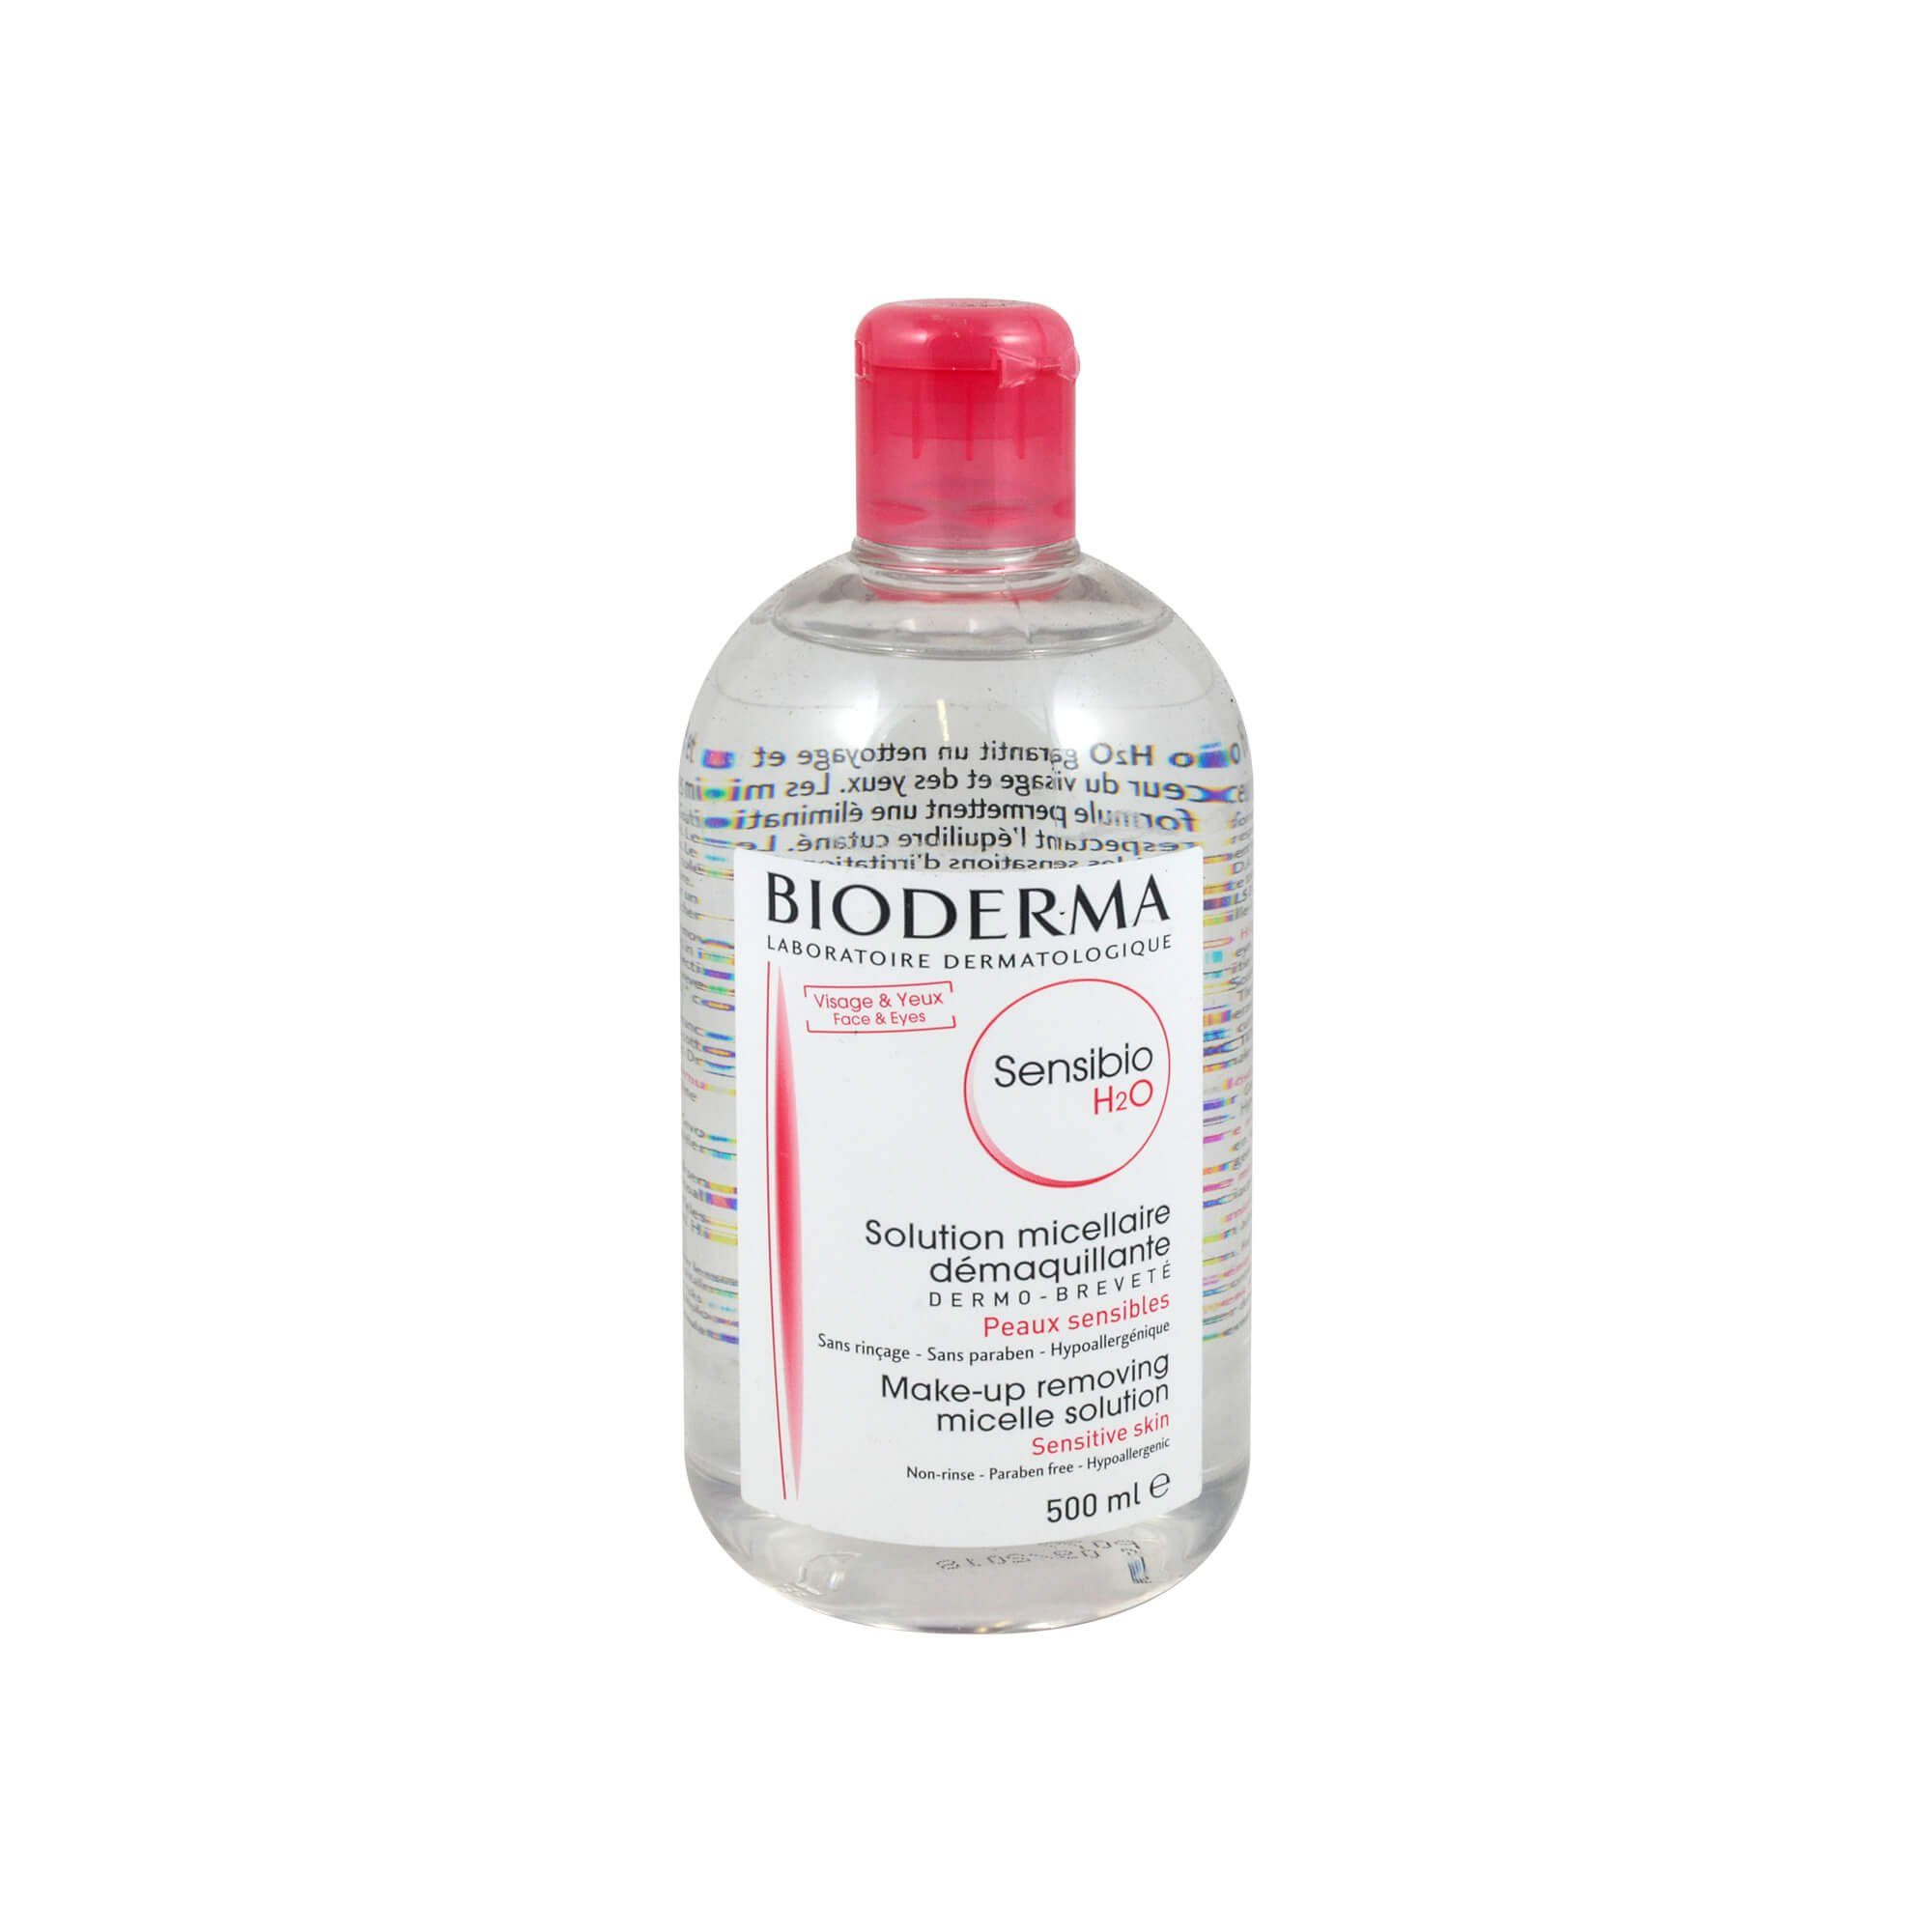 Bioderma Sensibio H2O reinigende Lösung, 500 ml